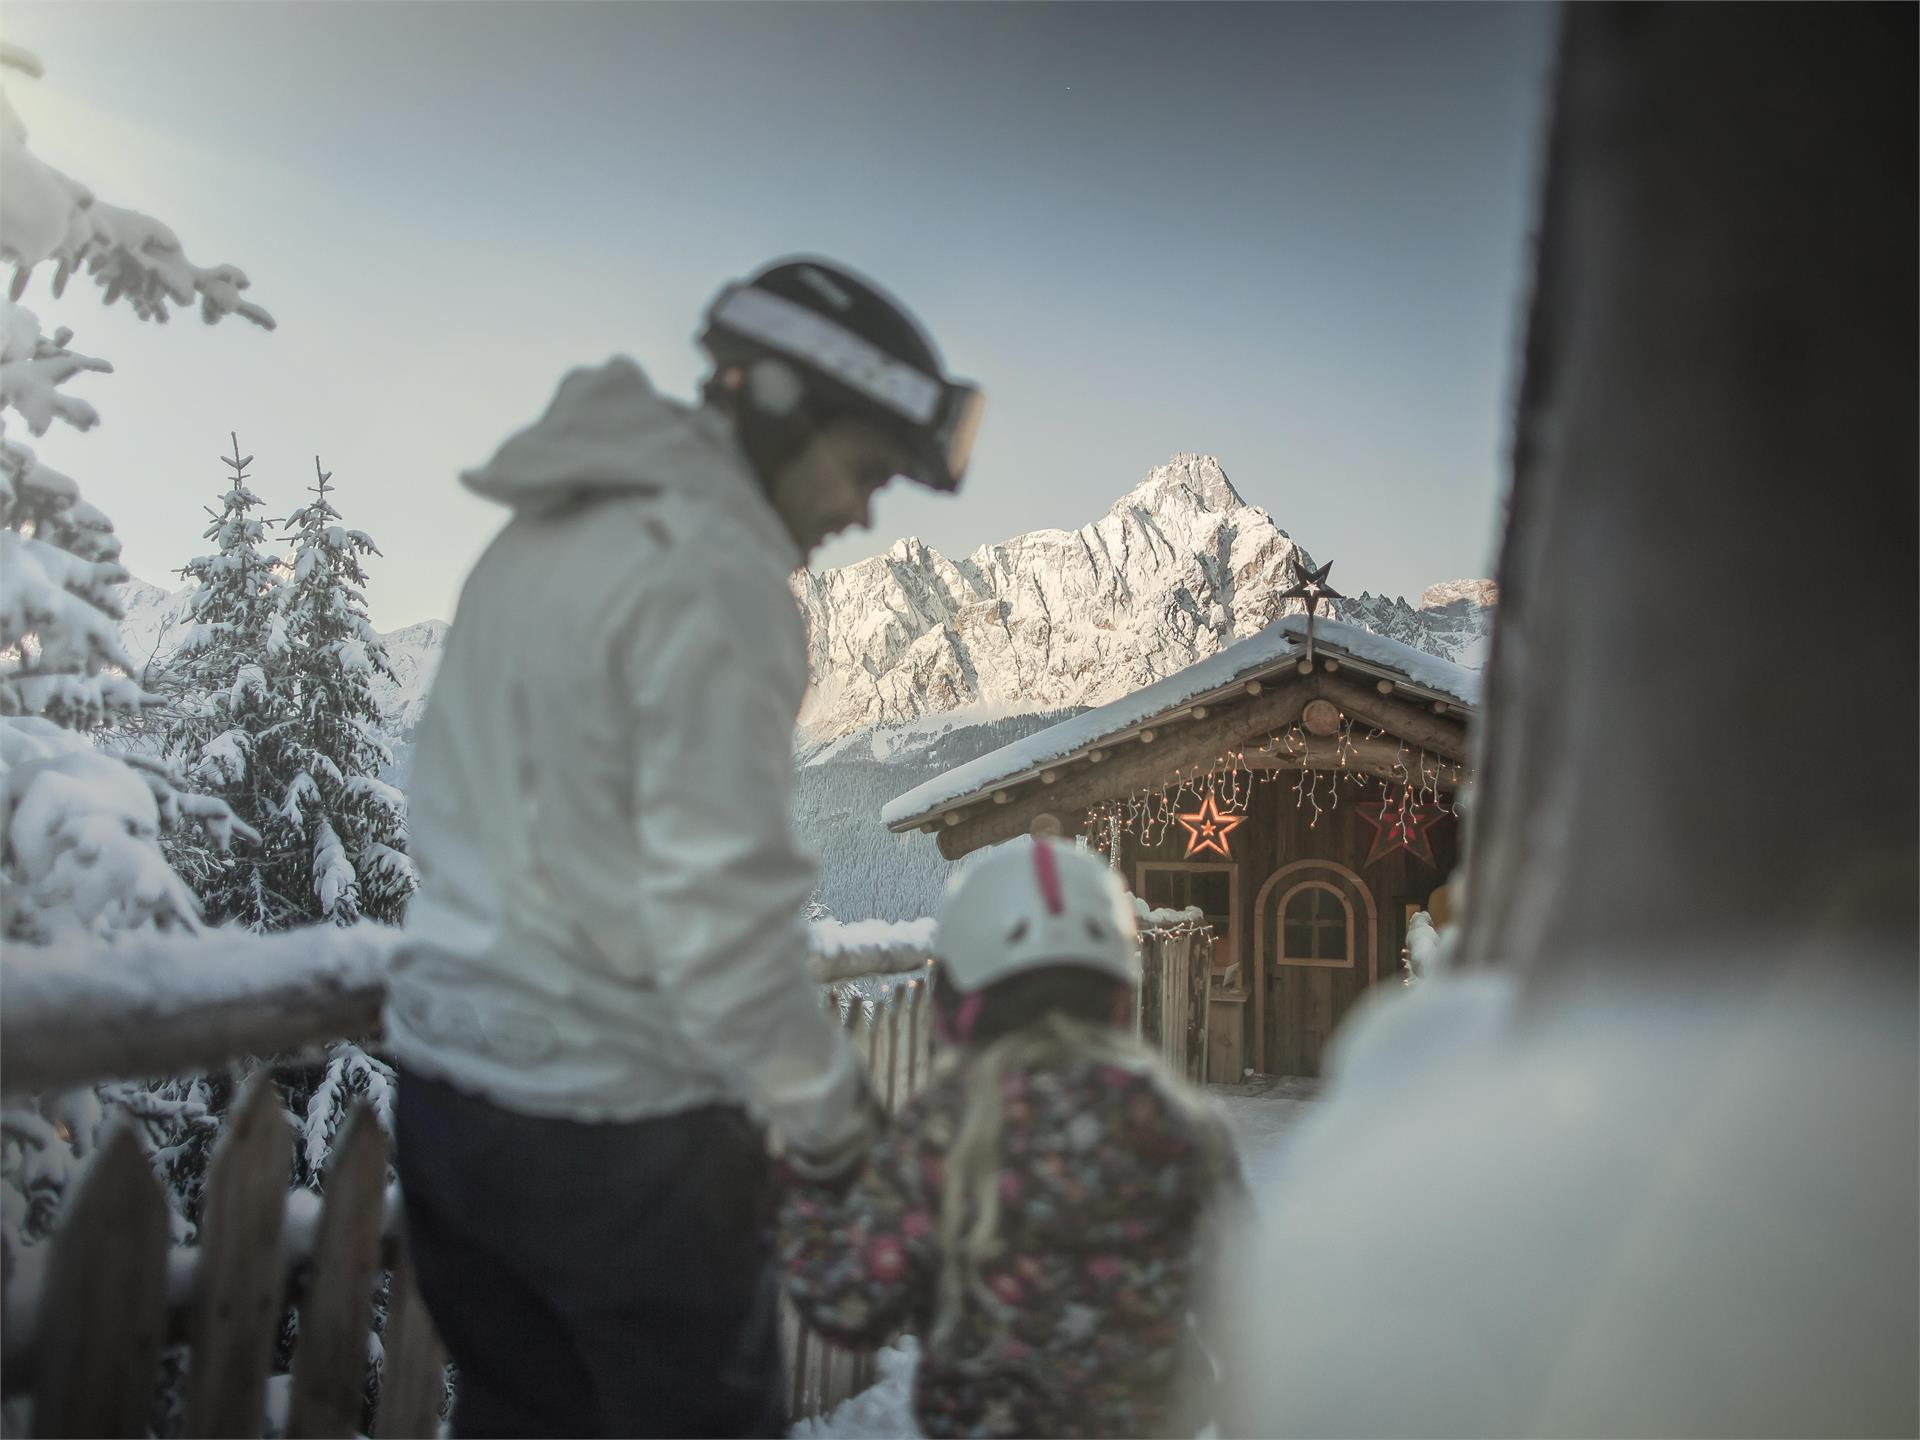 Natale & Sci 3 Zinnen